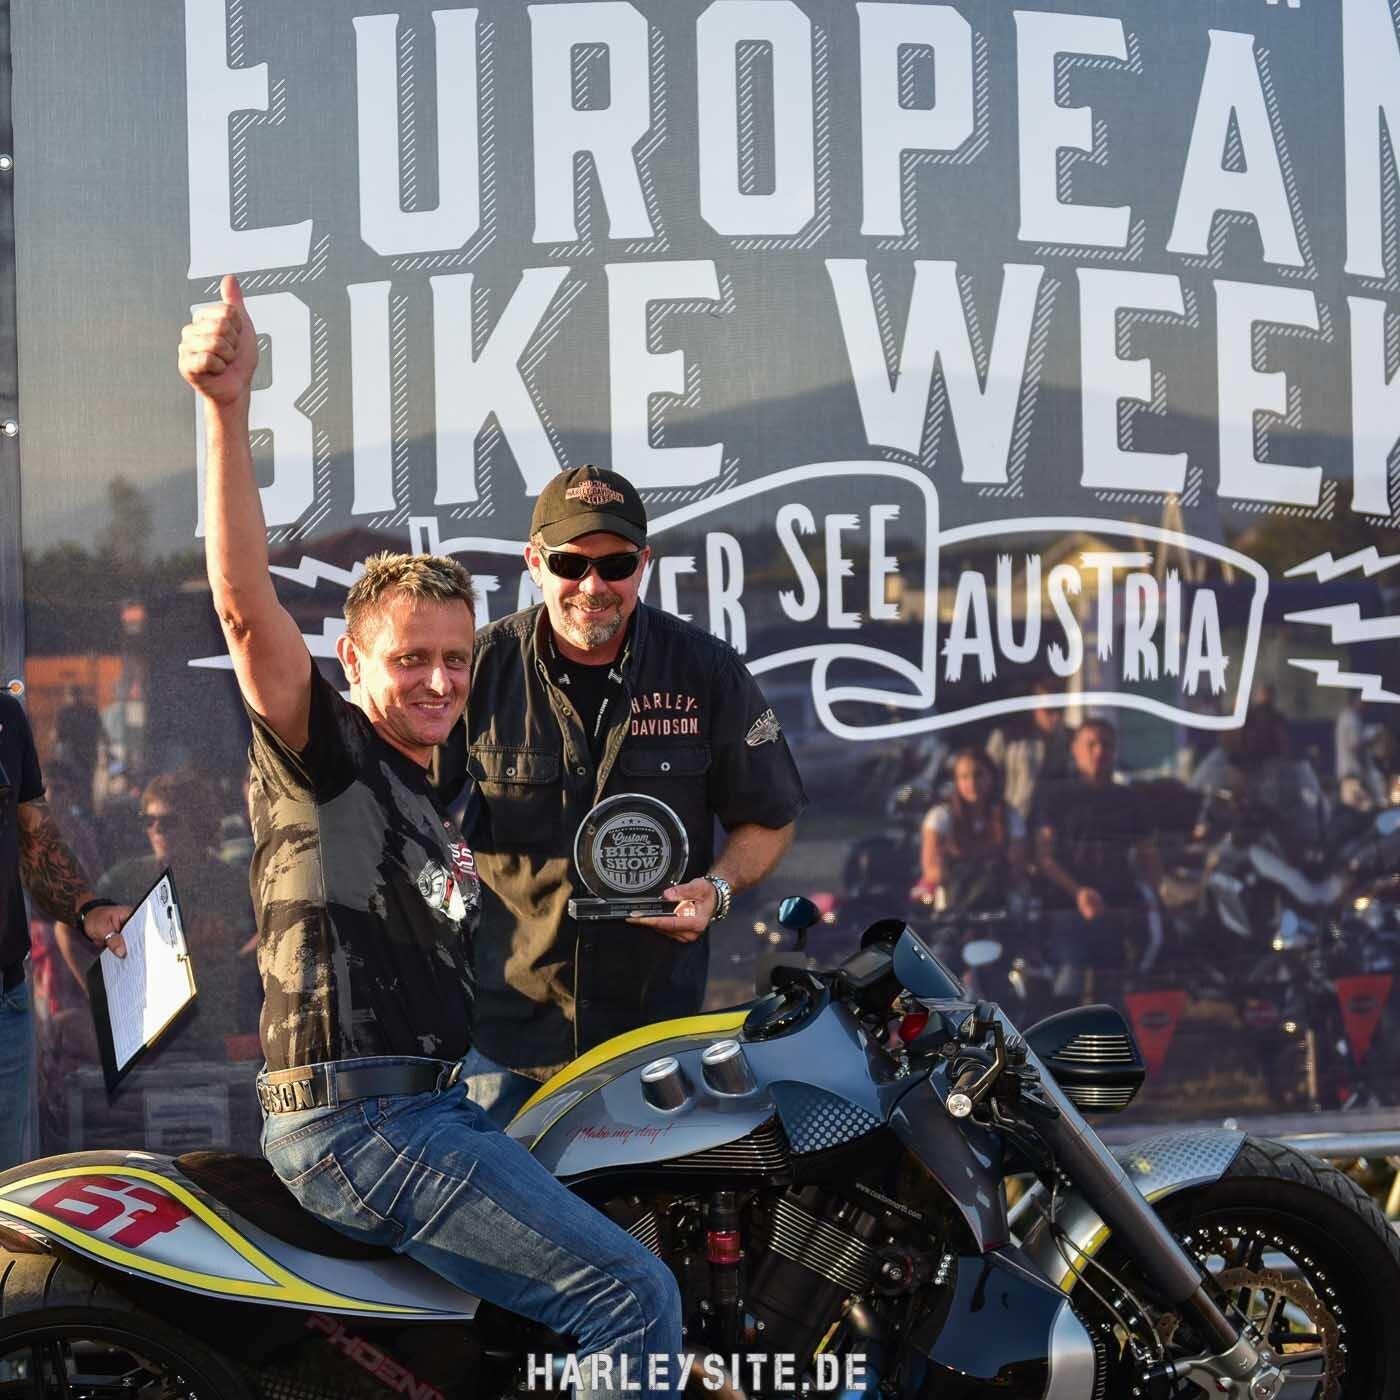 European-Bike-Week-0855